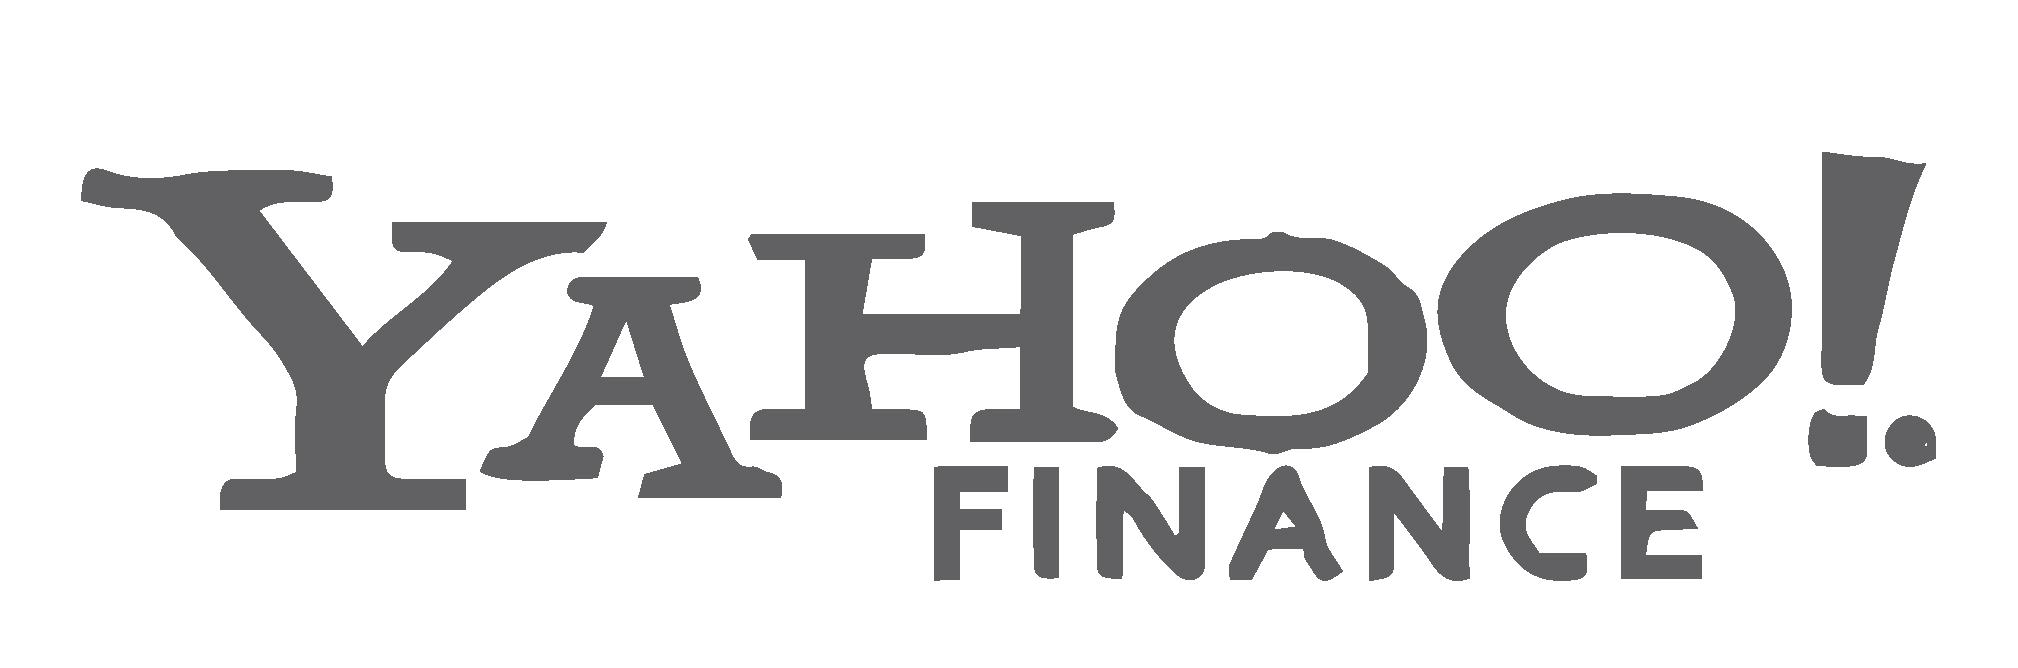 kisspng-yahoo-finance-logo-news-5ae561e8753666.9364233915249822484801.png